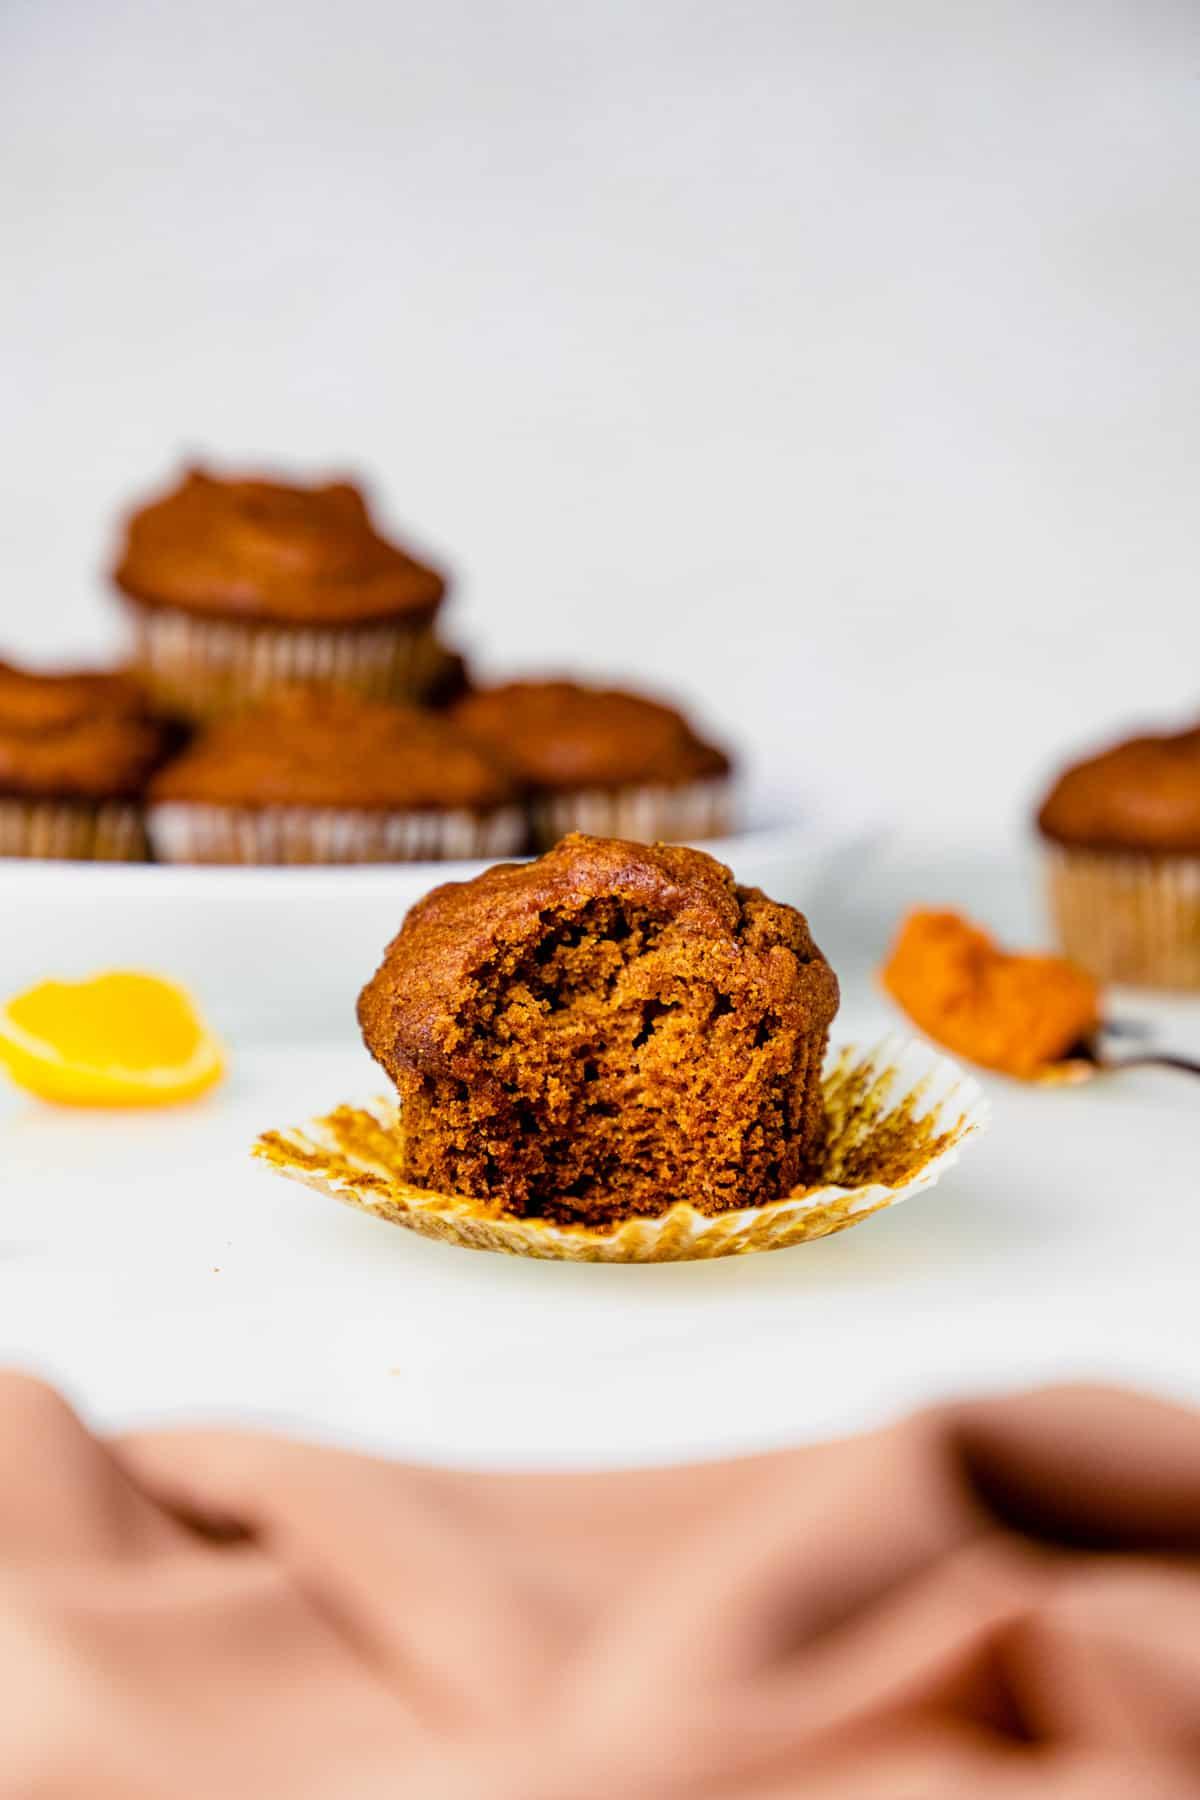 half eaten gluten free pumpkin muffin with a plate of gluten free pumpkin muffins in the background